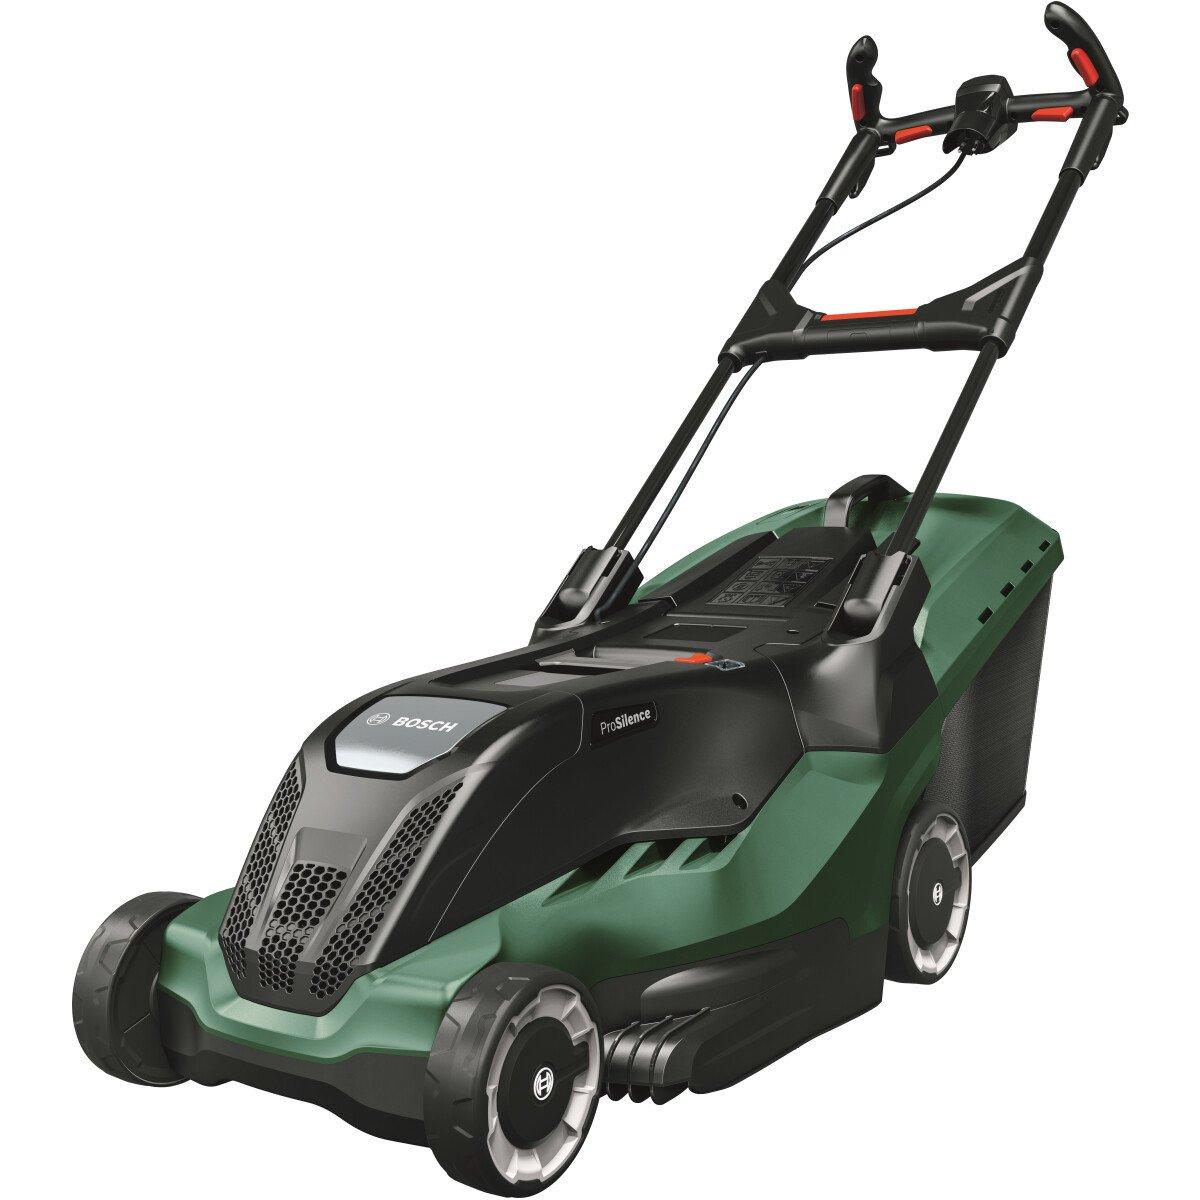 Bosch AdvancedRotak 750 1700W Lawn Mower 45cm Cut